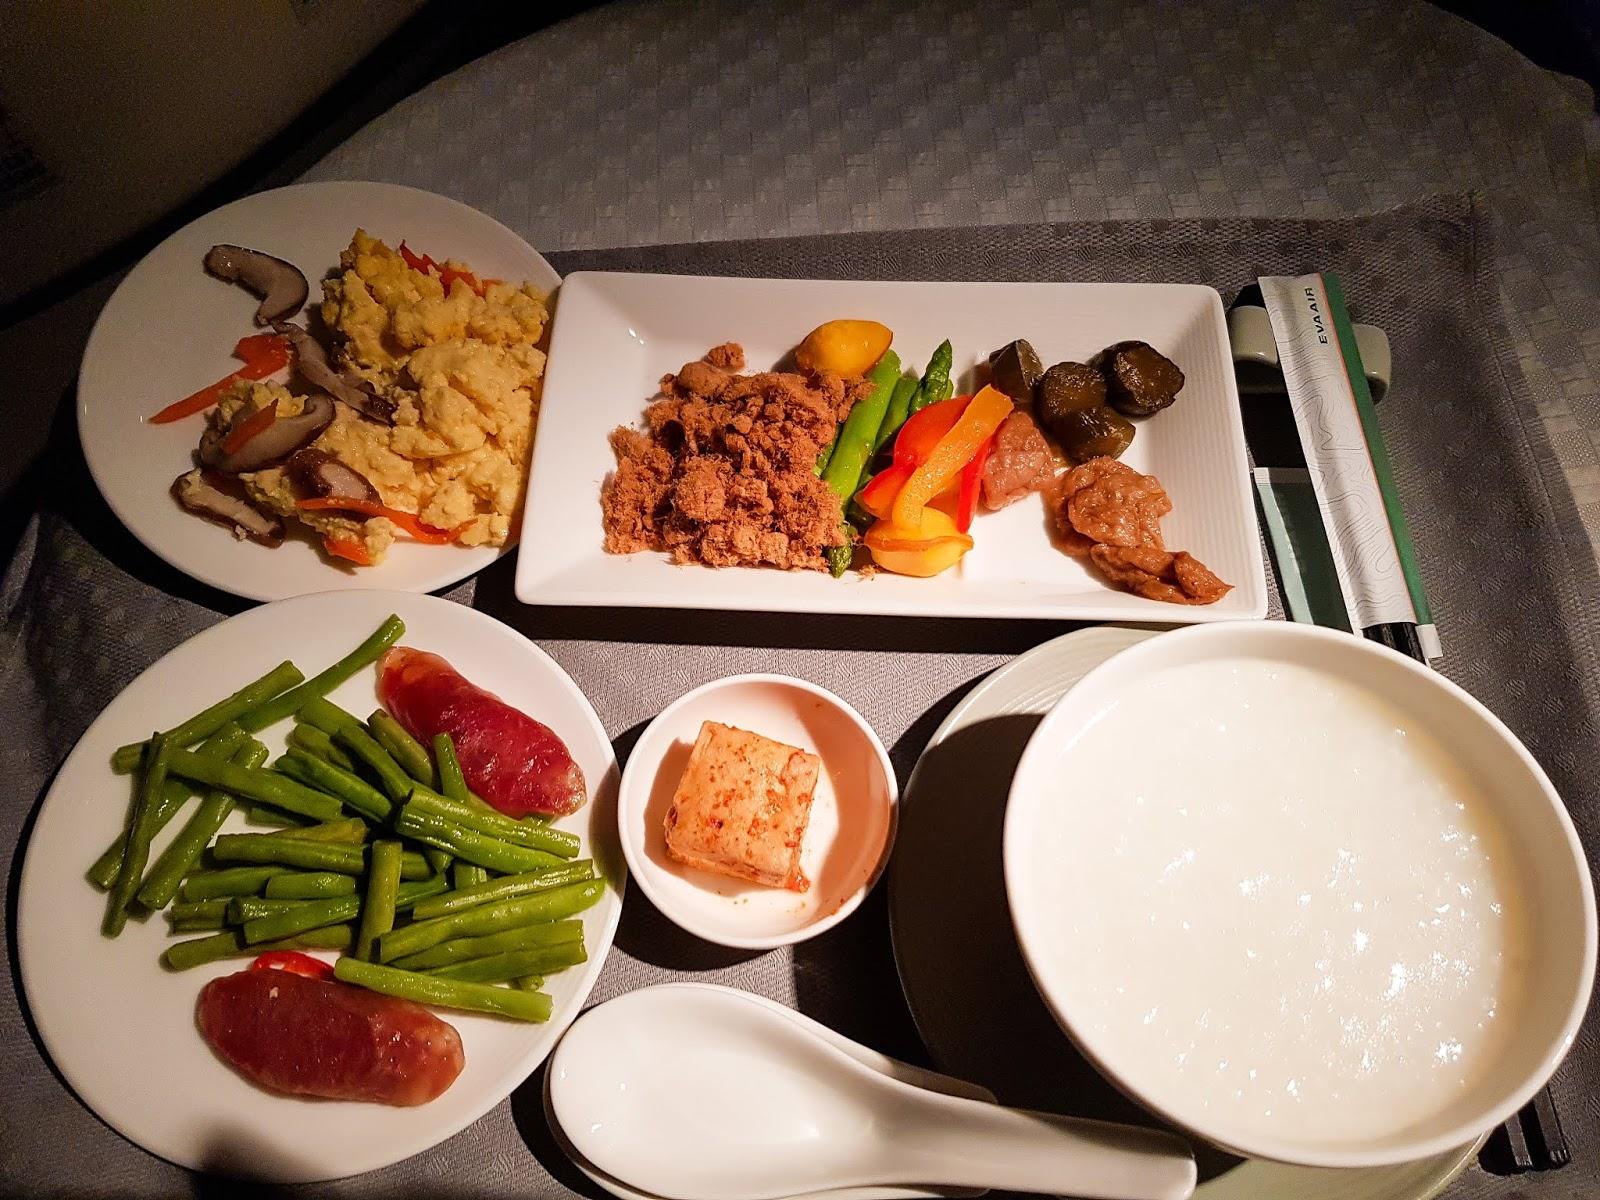 長榮航空 77W 商務艙 BR87 桃園→巴黎 TPE-CDG 早餐